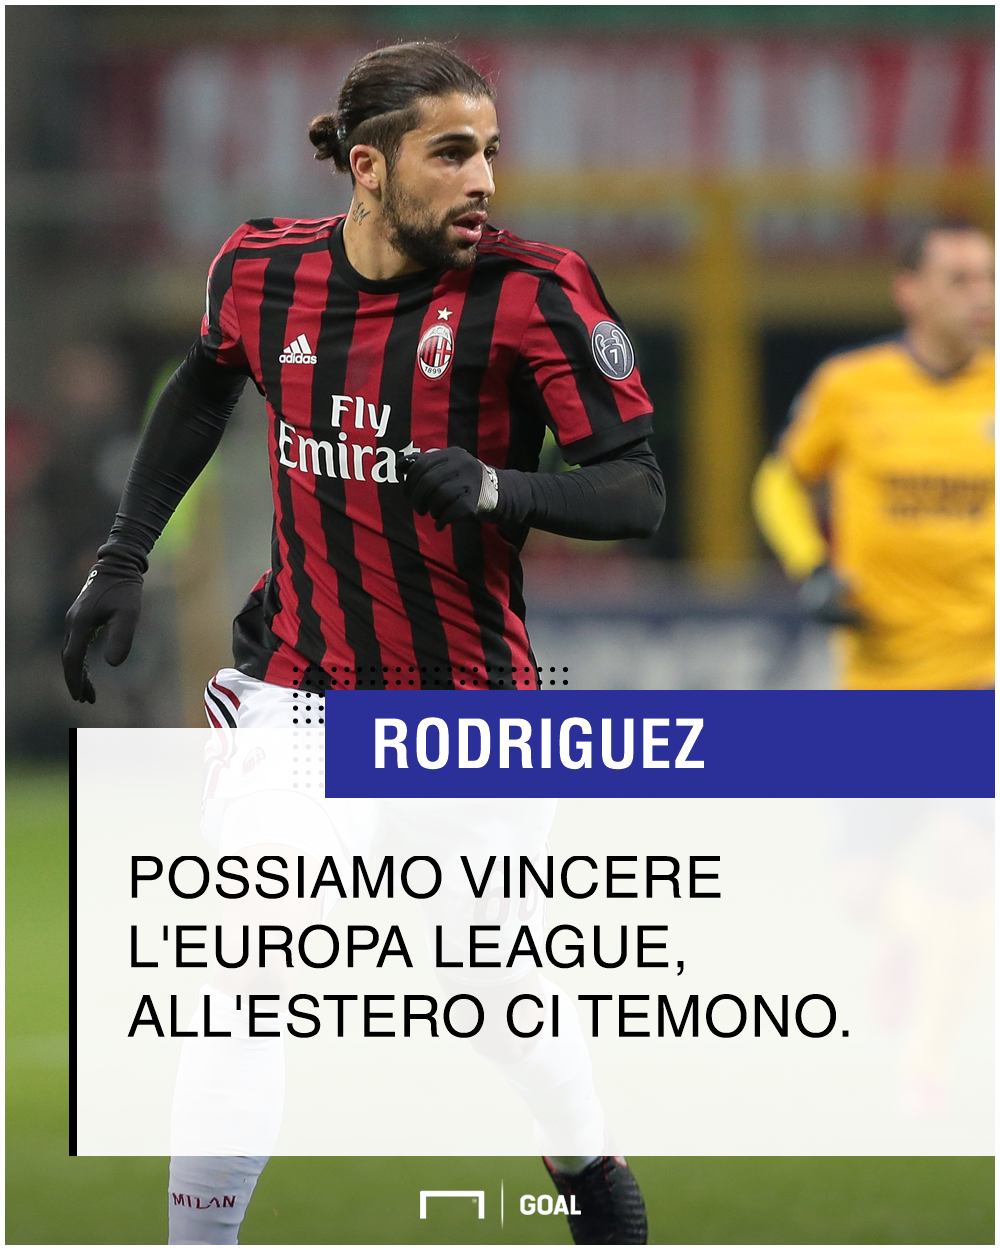 Rodriguez: